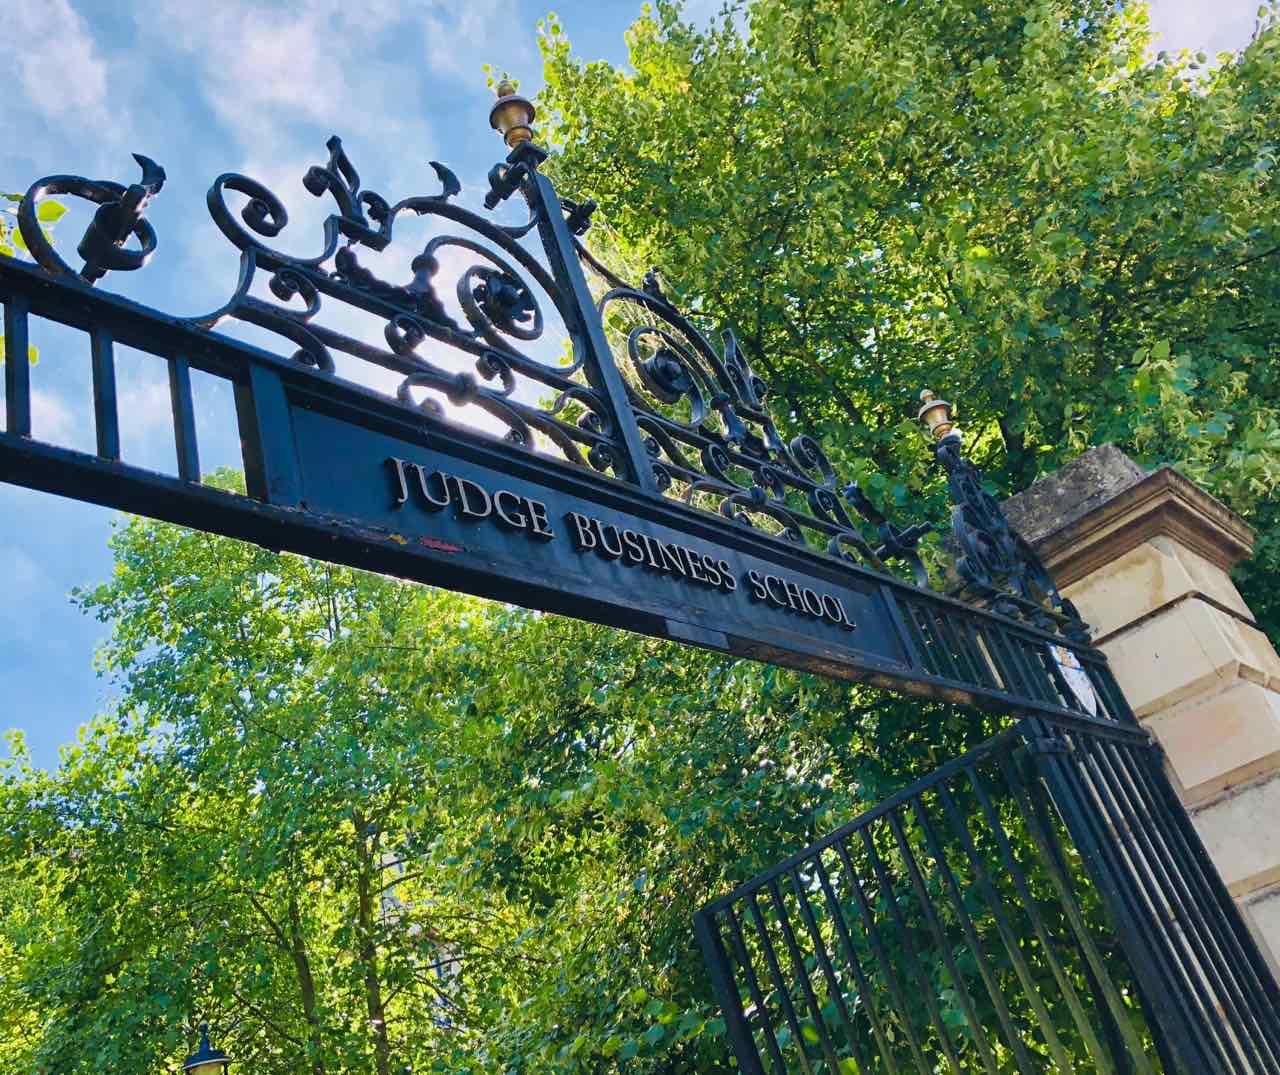 Regtech: Cambridge Centre for Alternative Finance Launches New Regulatory Benchmarking Survey